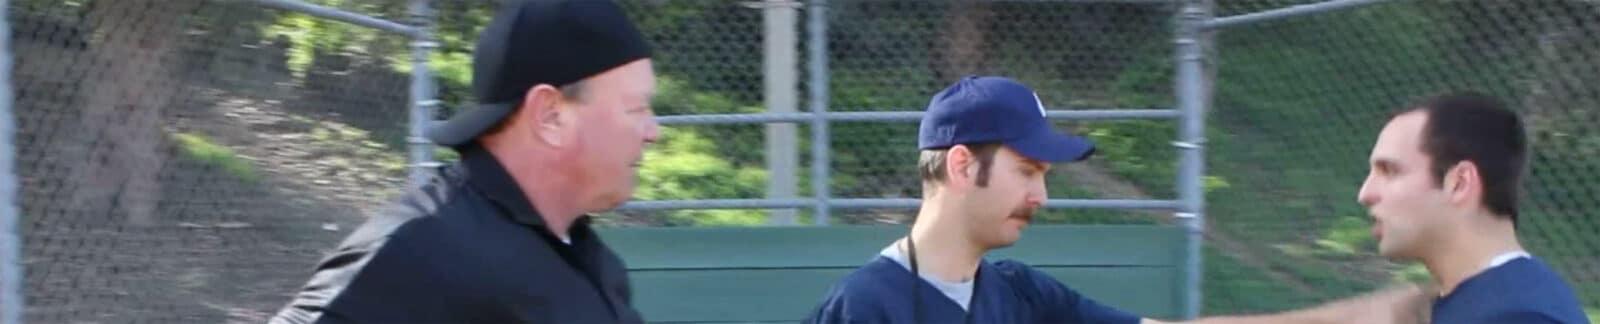 The Umpire baseball movie header